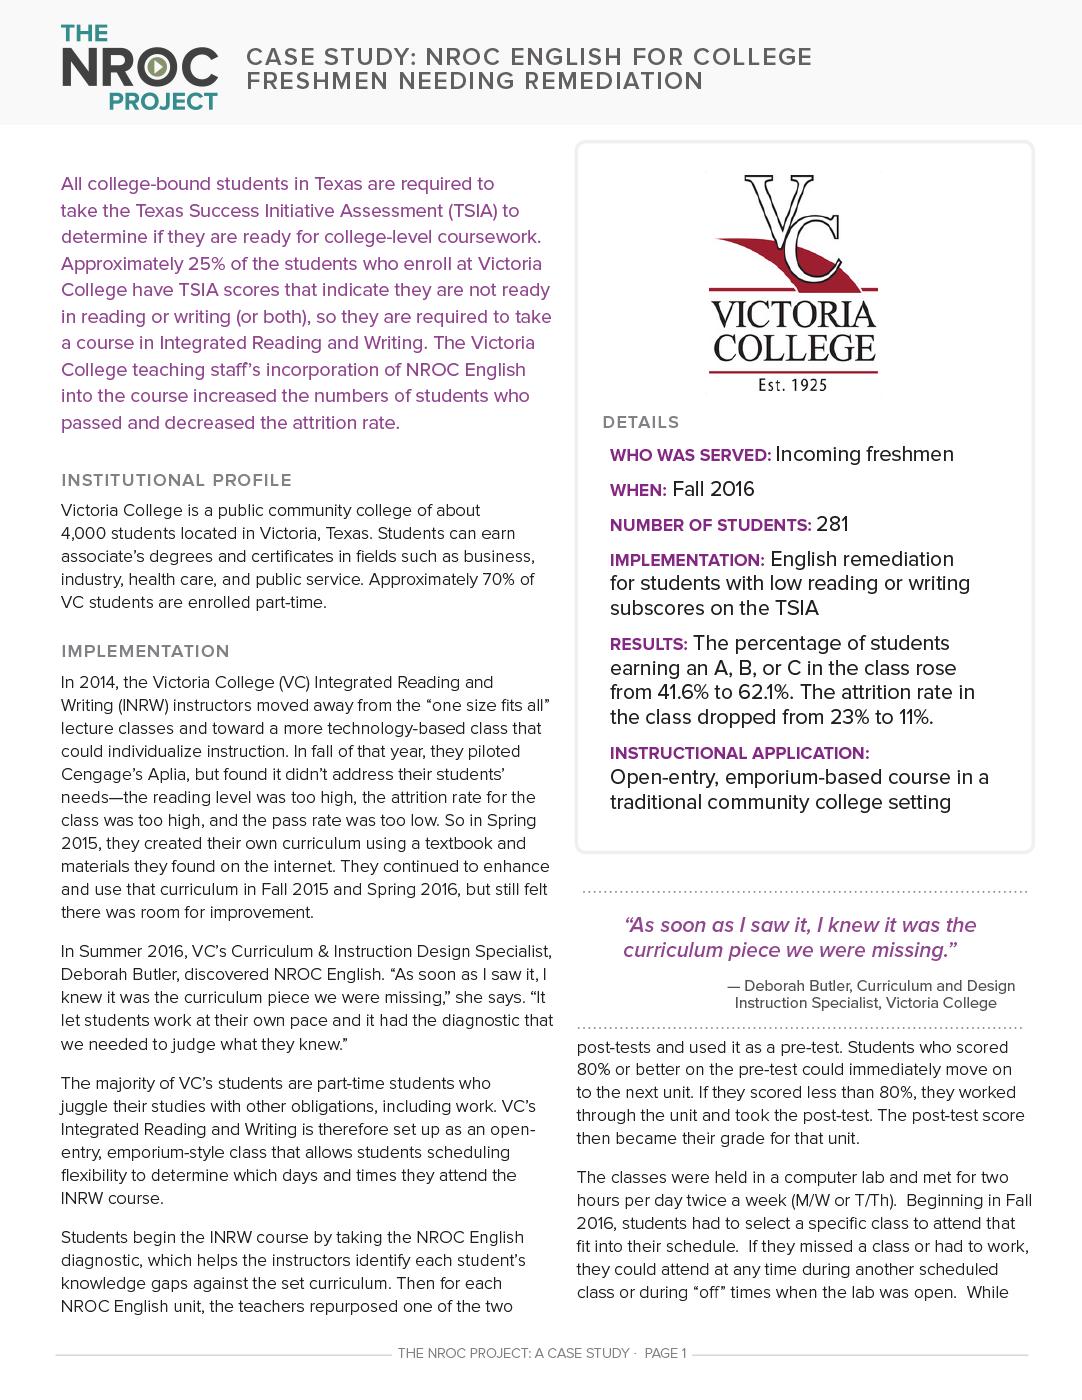 NROC English for College Freshmen Needing Remediation